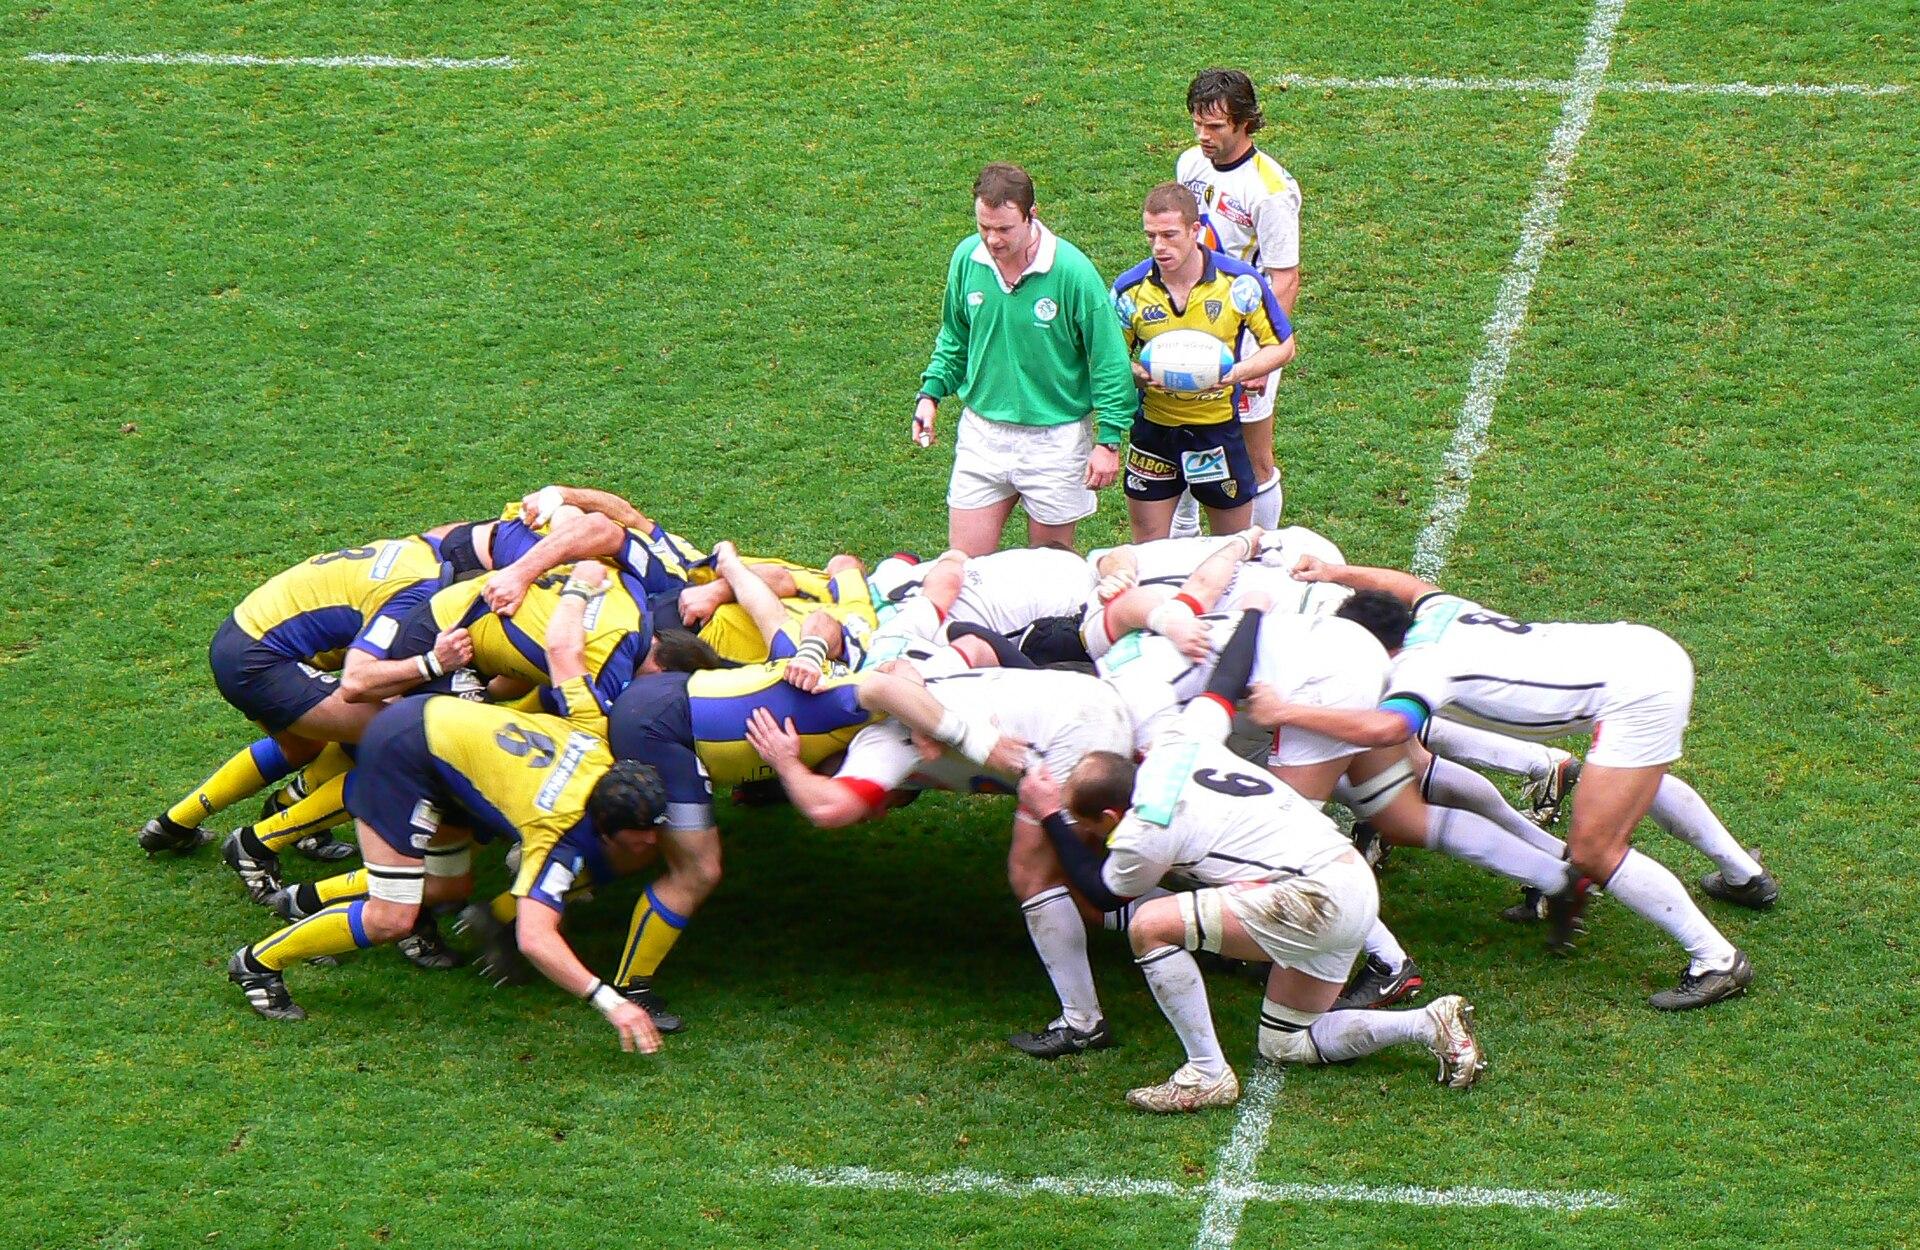 Rugby union - Wikipedia, den frie encyklopædi